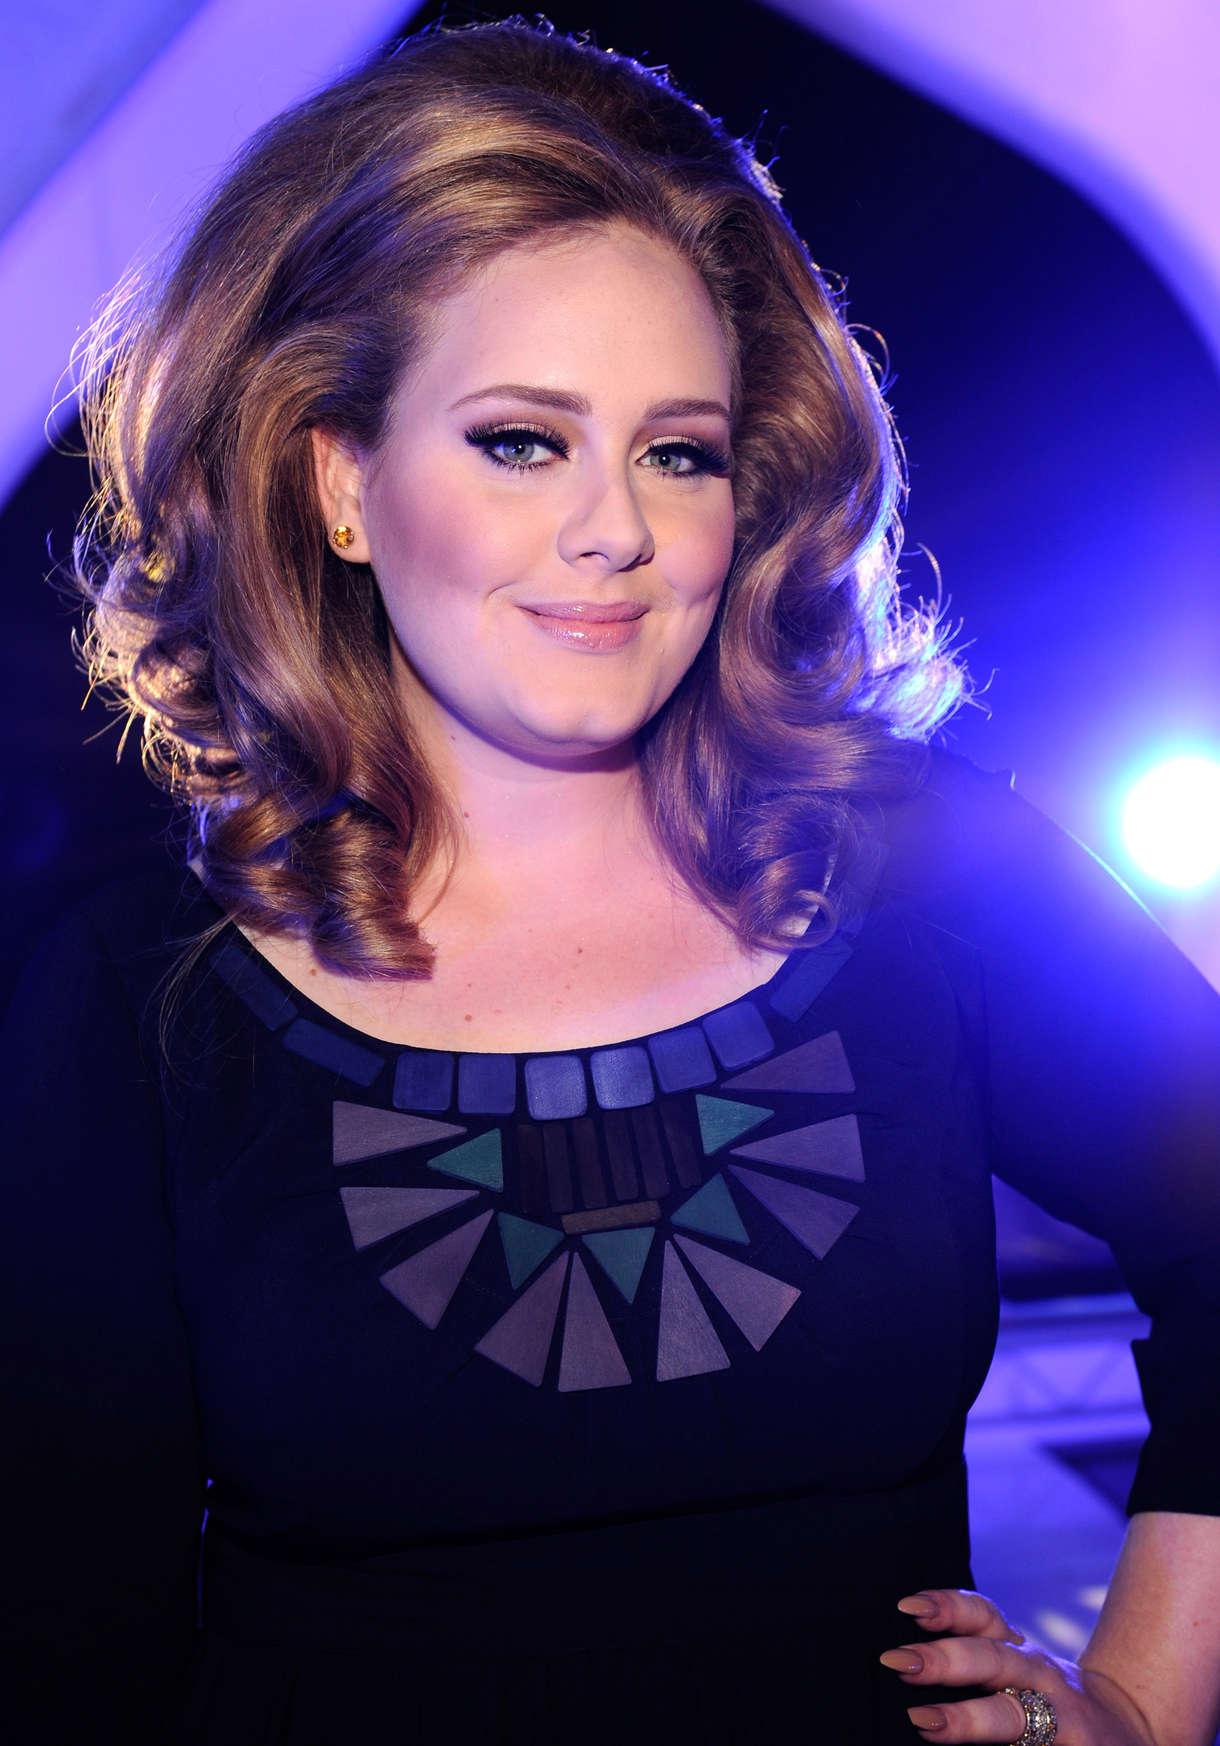 http://www.gotceleb.com/wp-content/uploads/celebrities/adele-2011/mtv-video-music-awards/Adele%20-%202011%20MTV%20Video%20Music%20Awards-02.jpg